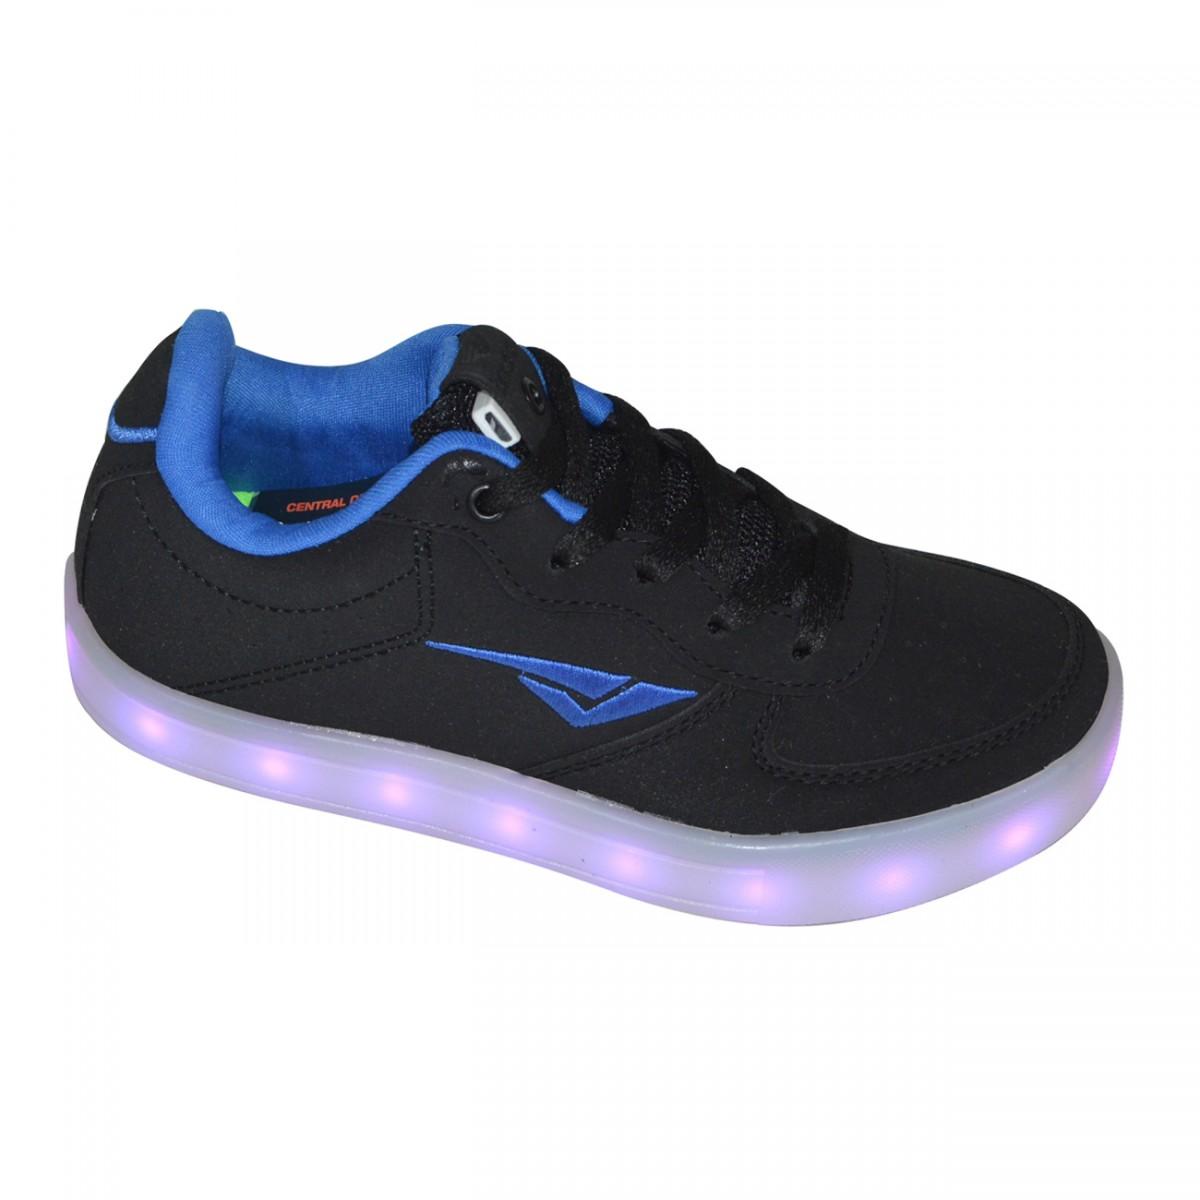 9b79f14f78e Tenis Bouts Teen Luzinha Juvenil 4054 - 327 - Preto Royal - Chuteira Nike